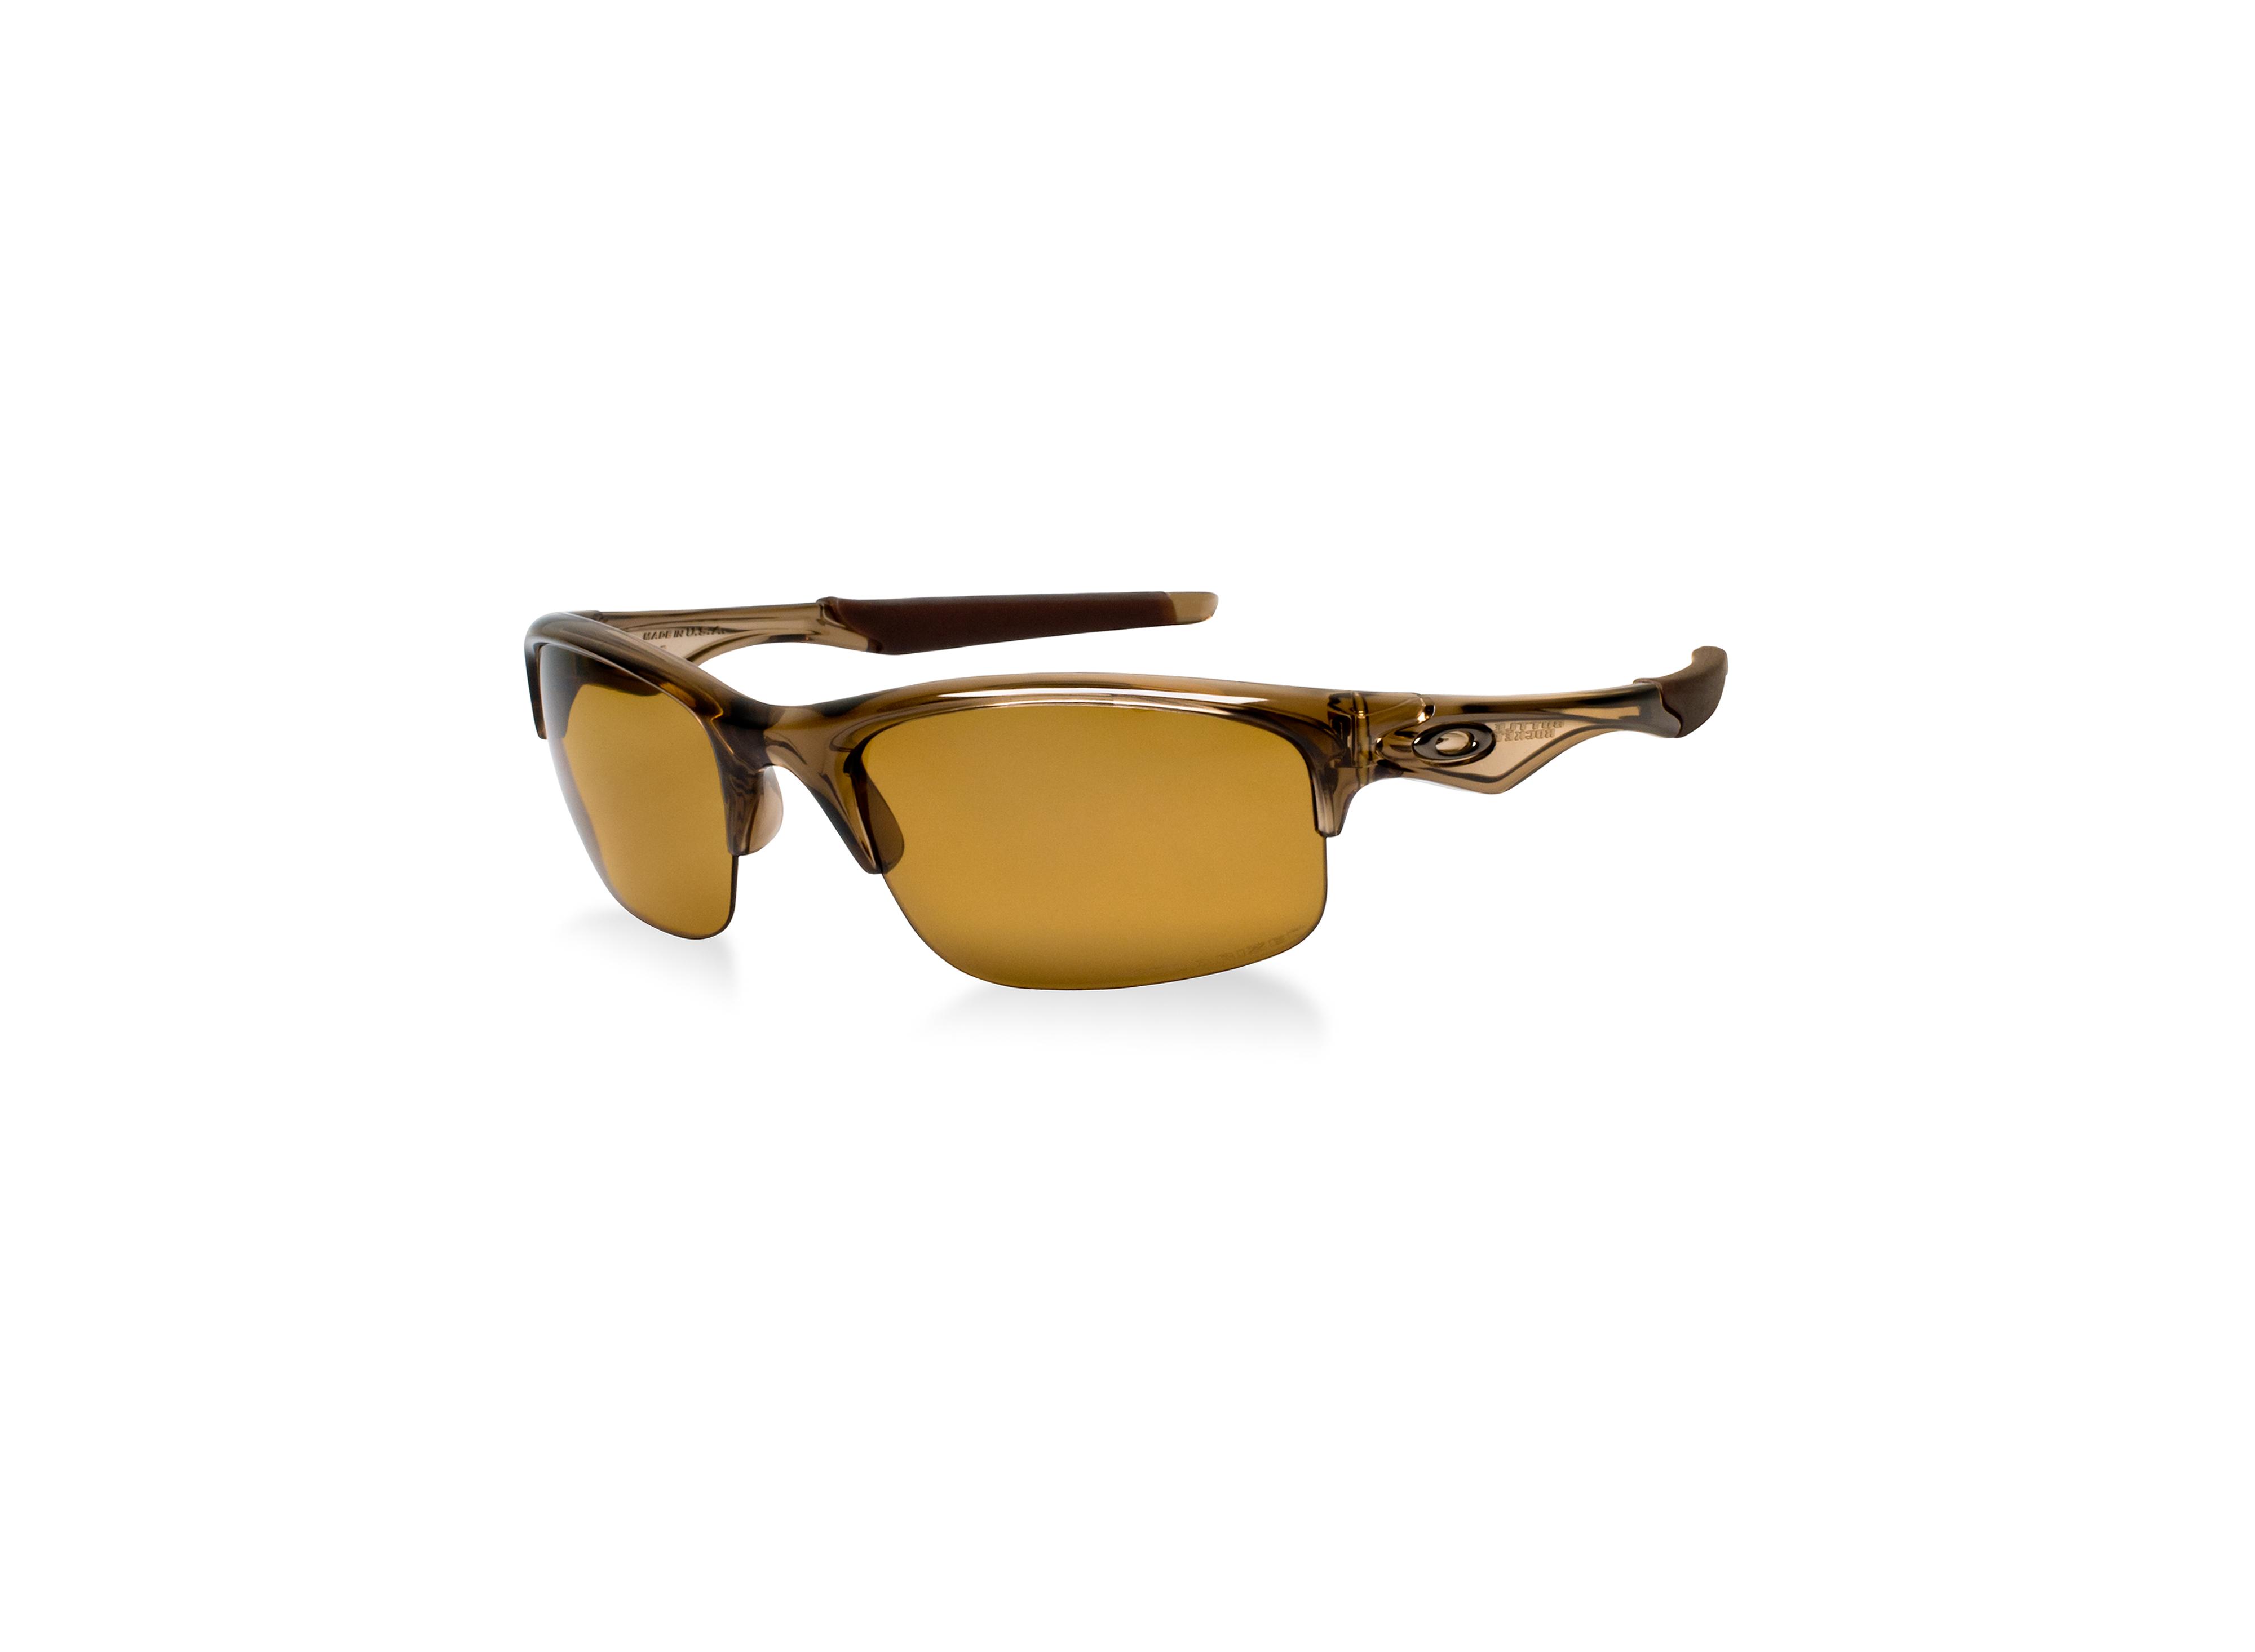 f665b1f700 ... canada oakley polarized sunglasses bottle rocket sunglasses by sunglass  hut men macys 6f3c3 e04fa